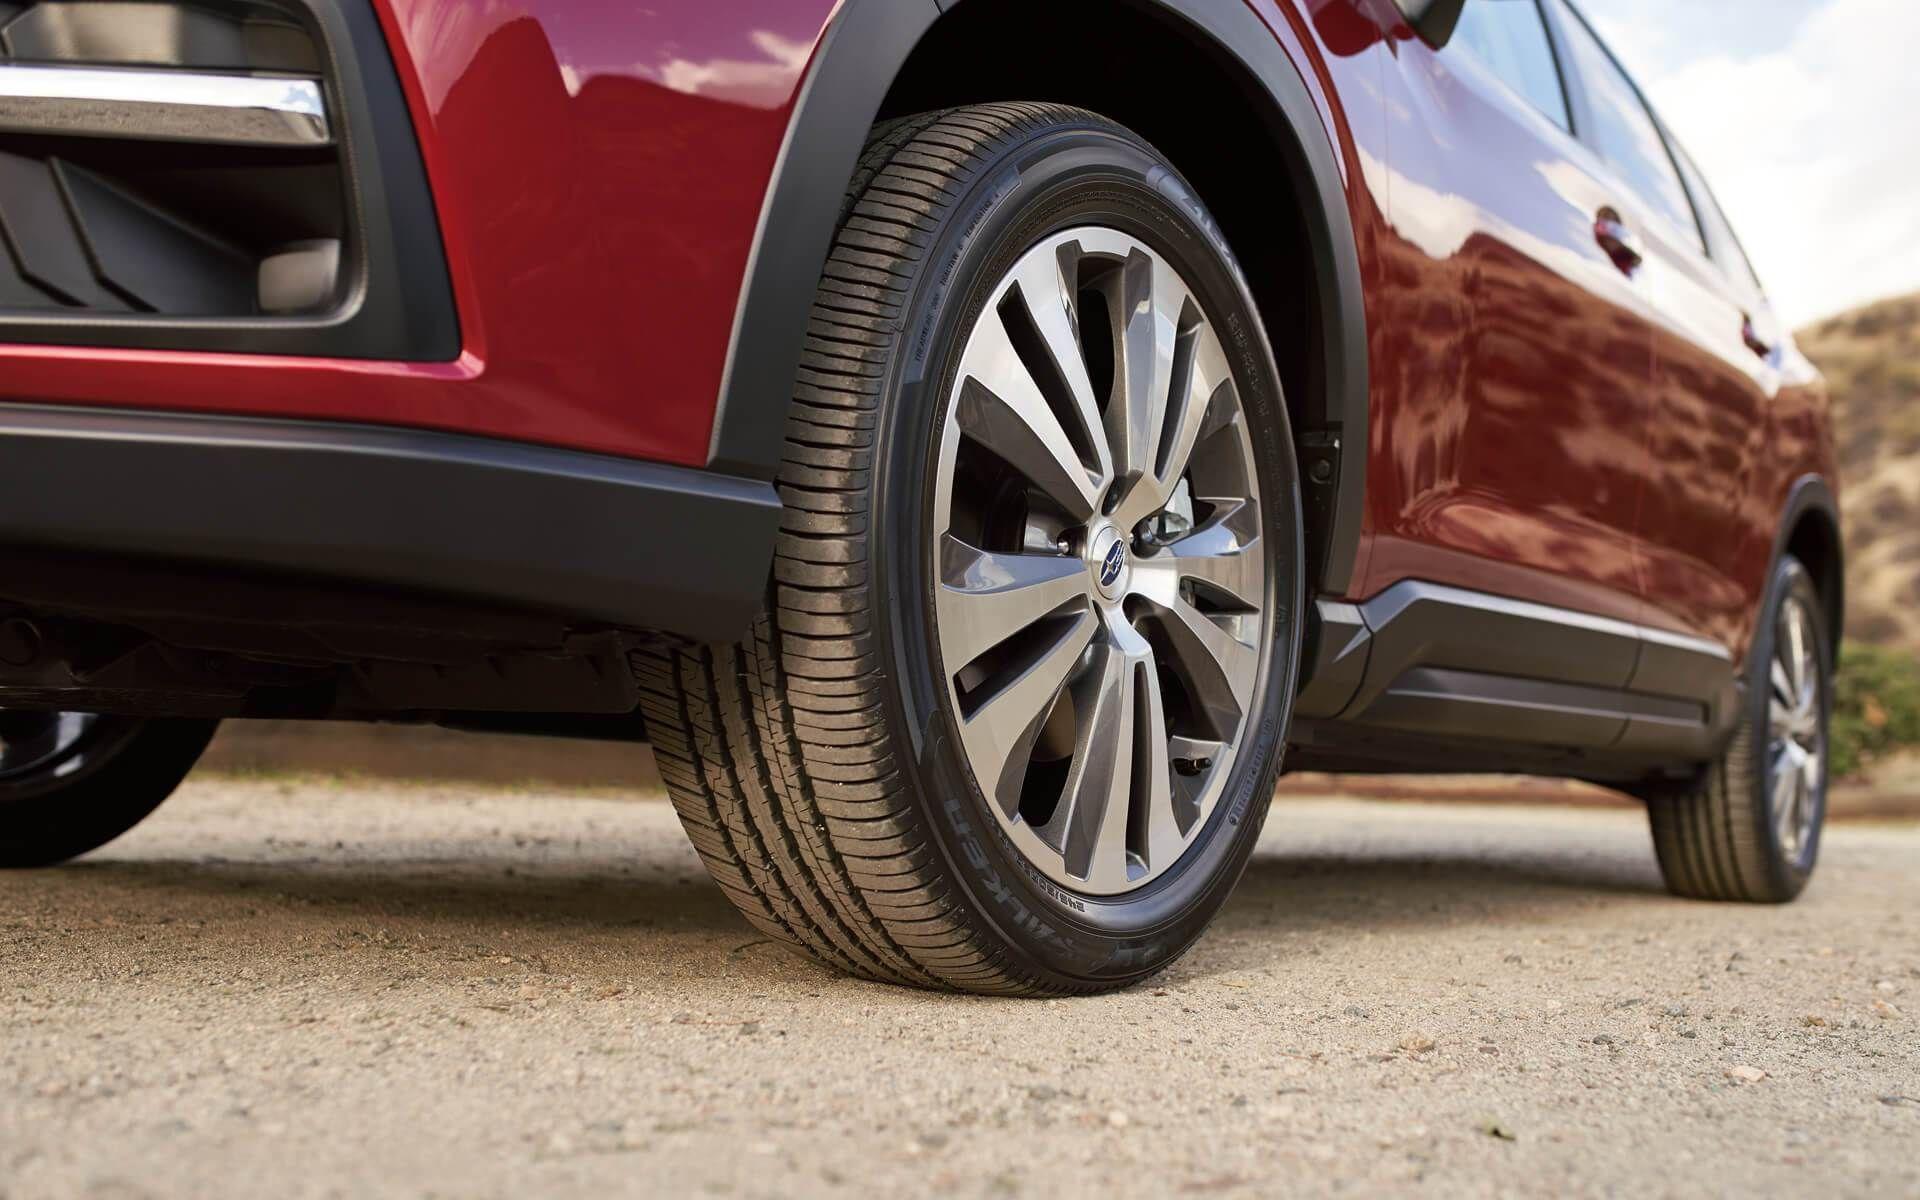 2019 Subaru Ascent Subaru, Suv, Suv car